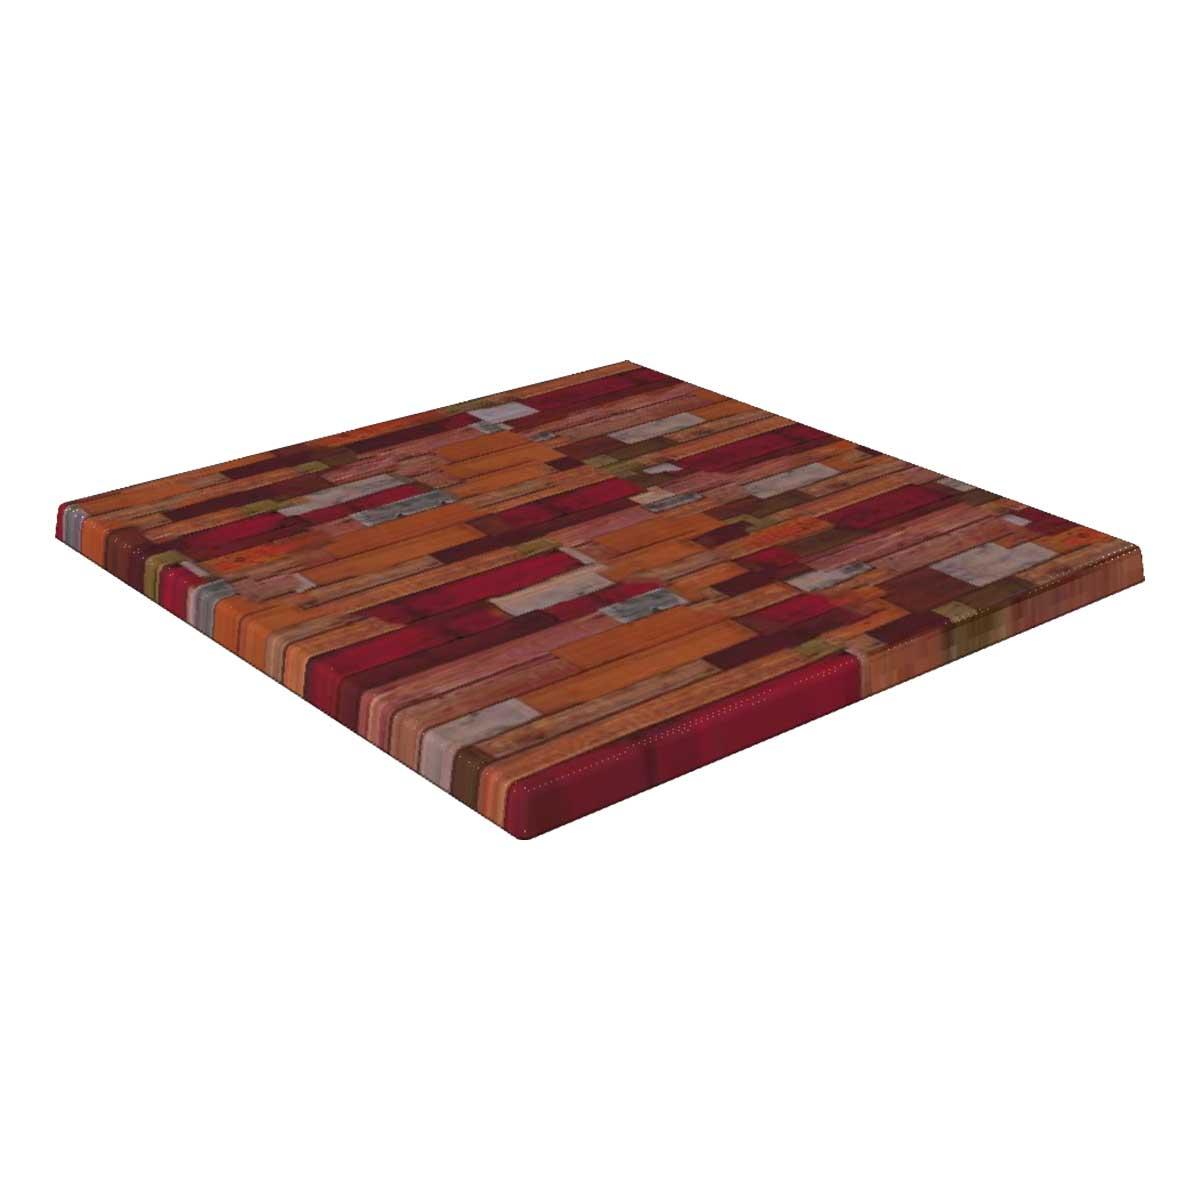 TICLA Q70 266 - https://www.werzalit.com/nl/product/tafelblad-classic-werzalit-q-60x60-266-blanchas-rot/